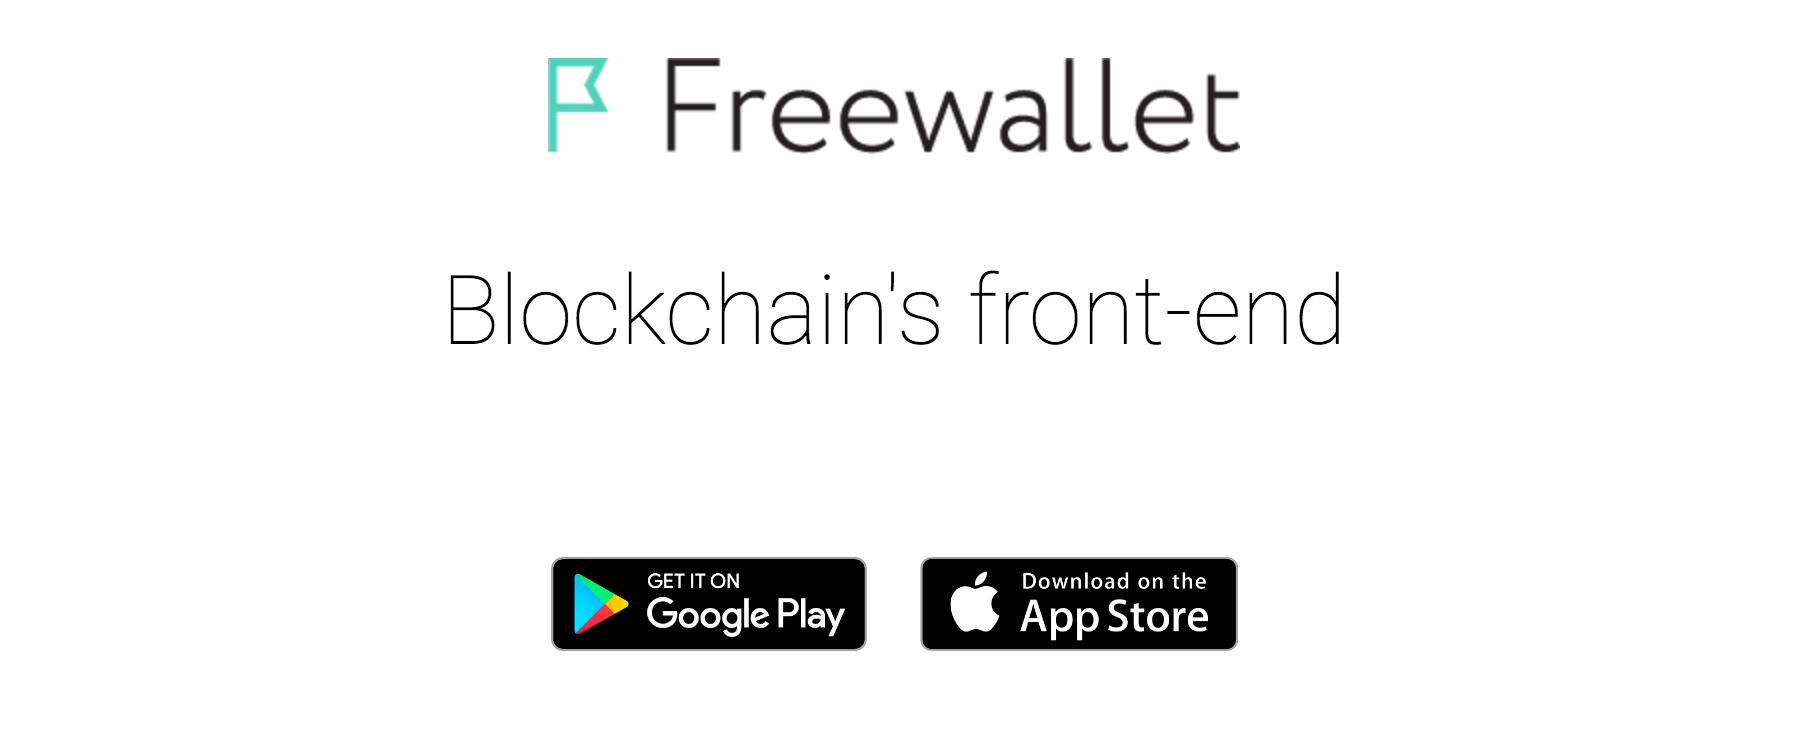 freewallet iOS app, Etheruem wallet